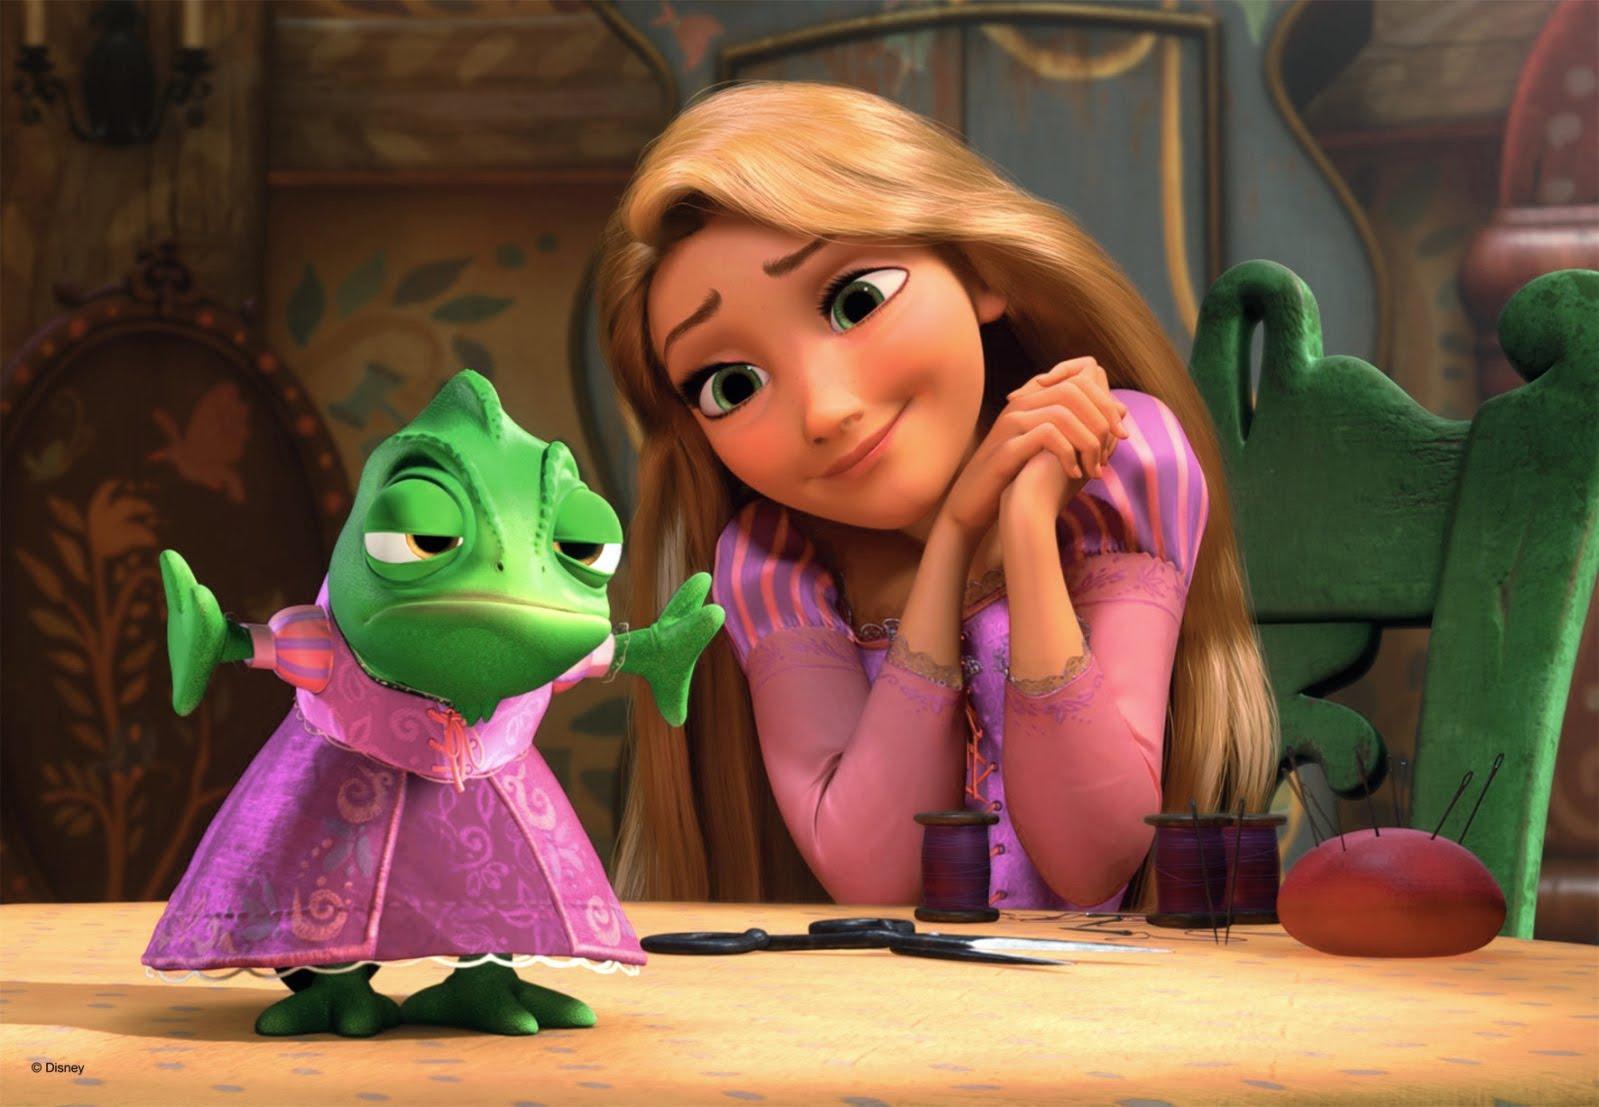 Disney Rapunzel From Tangled